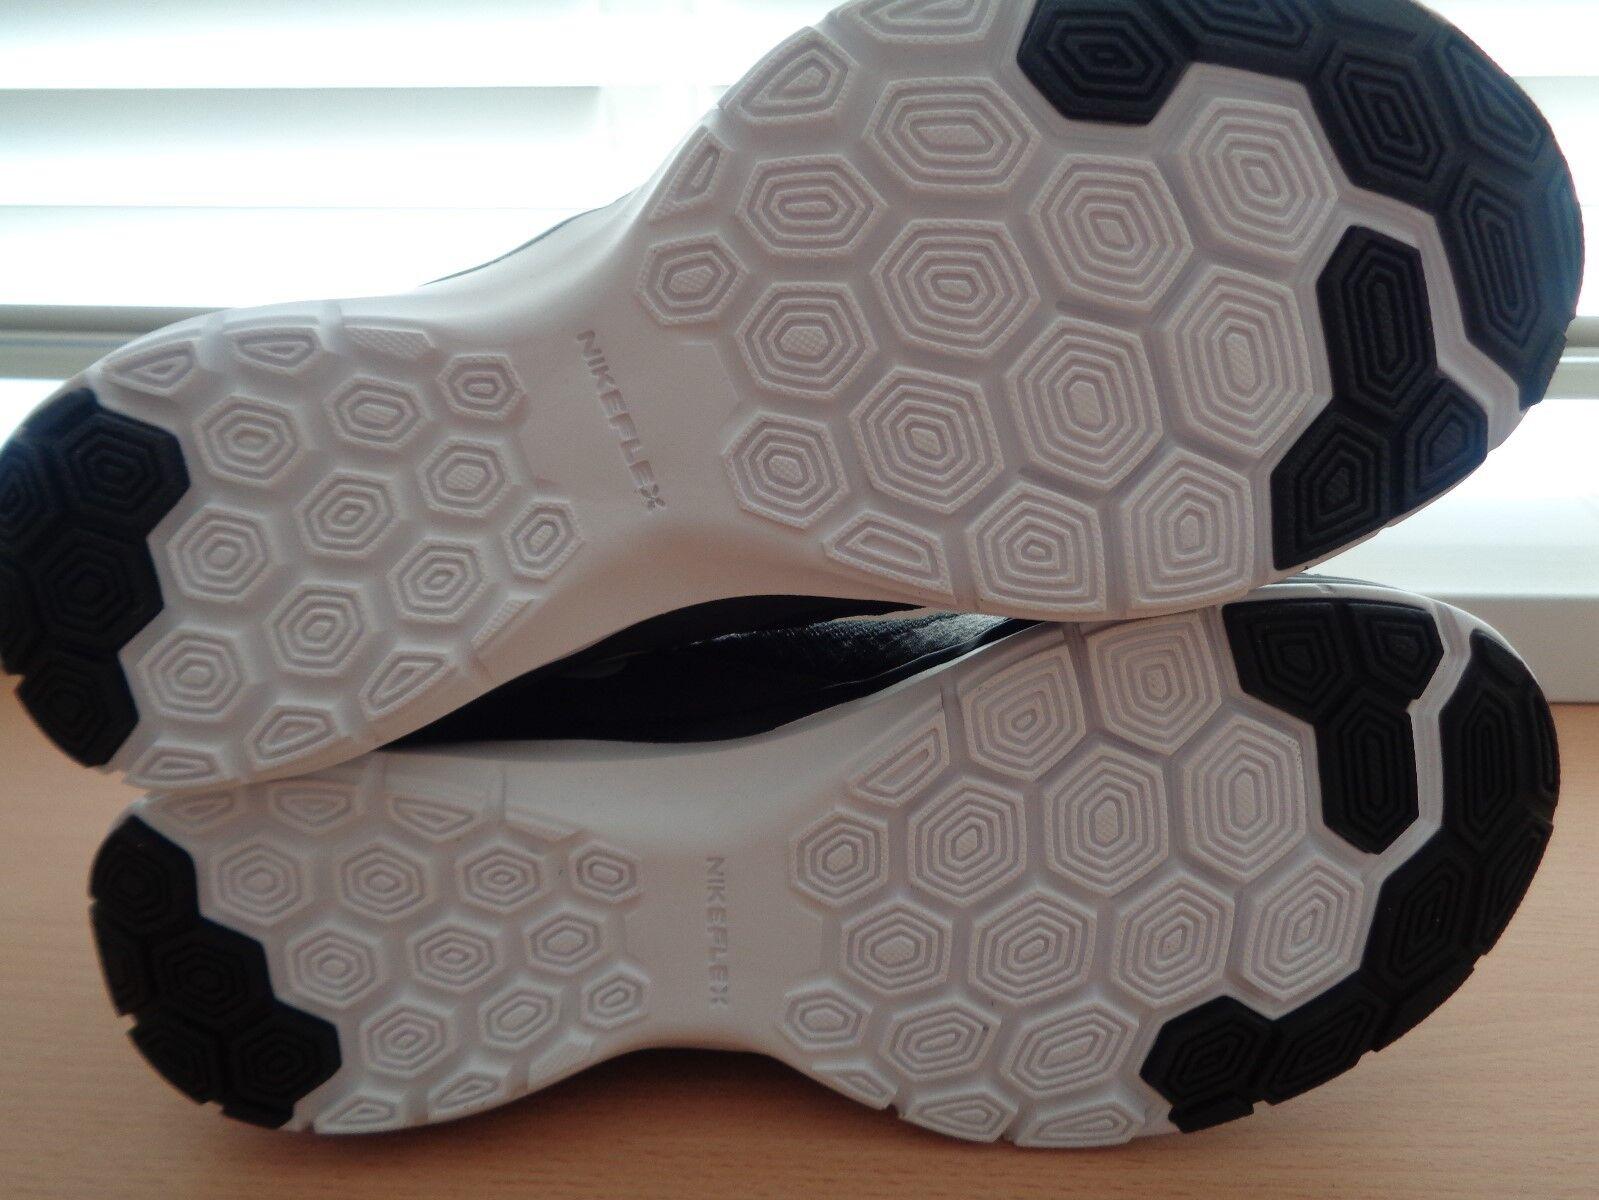 Nike Flex Trainer 5 Zapatillas para UK mujer 724858 001 UK para 3.5 EU 36.5 nos 6 Nuevo + Caja b4b82d